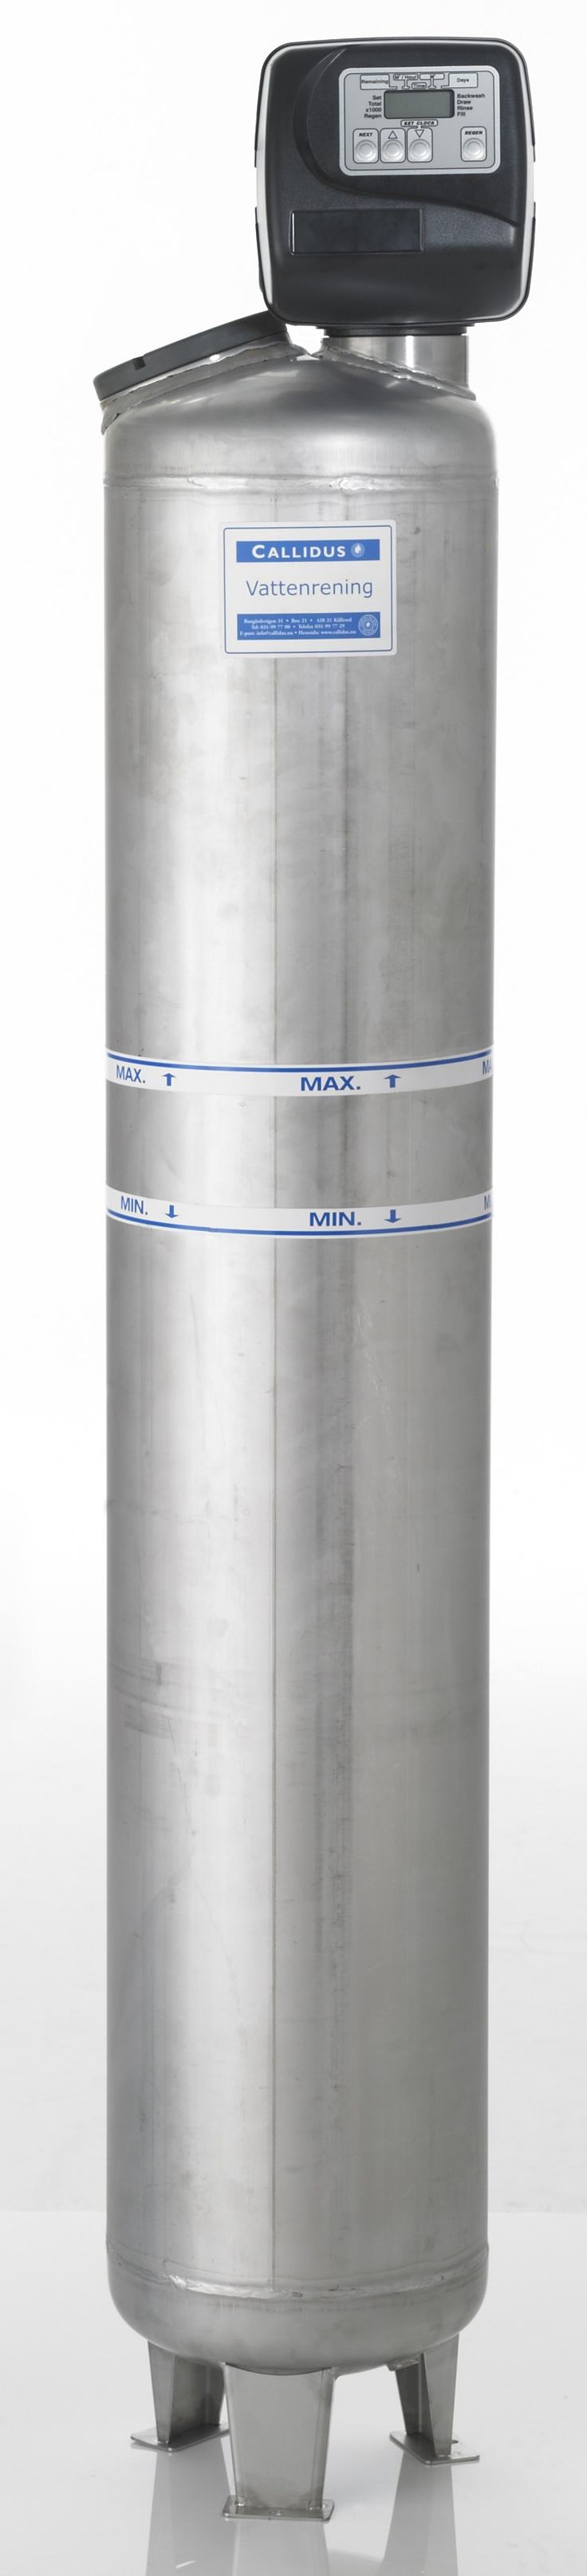 Rostfritt vattenfilter #vattenrening